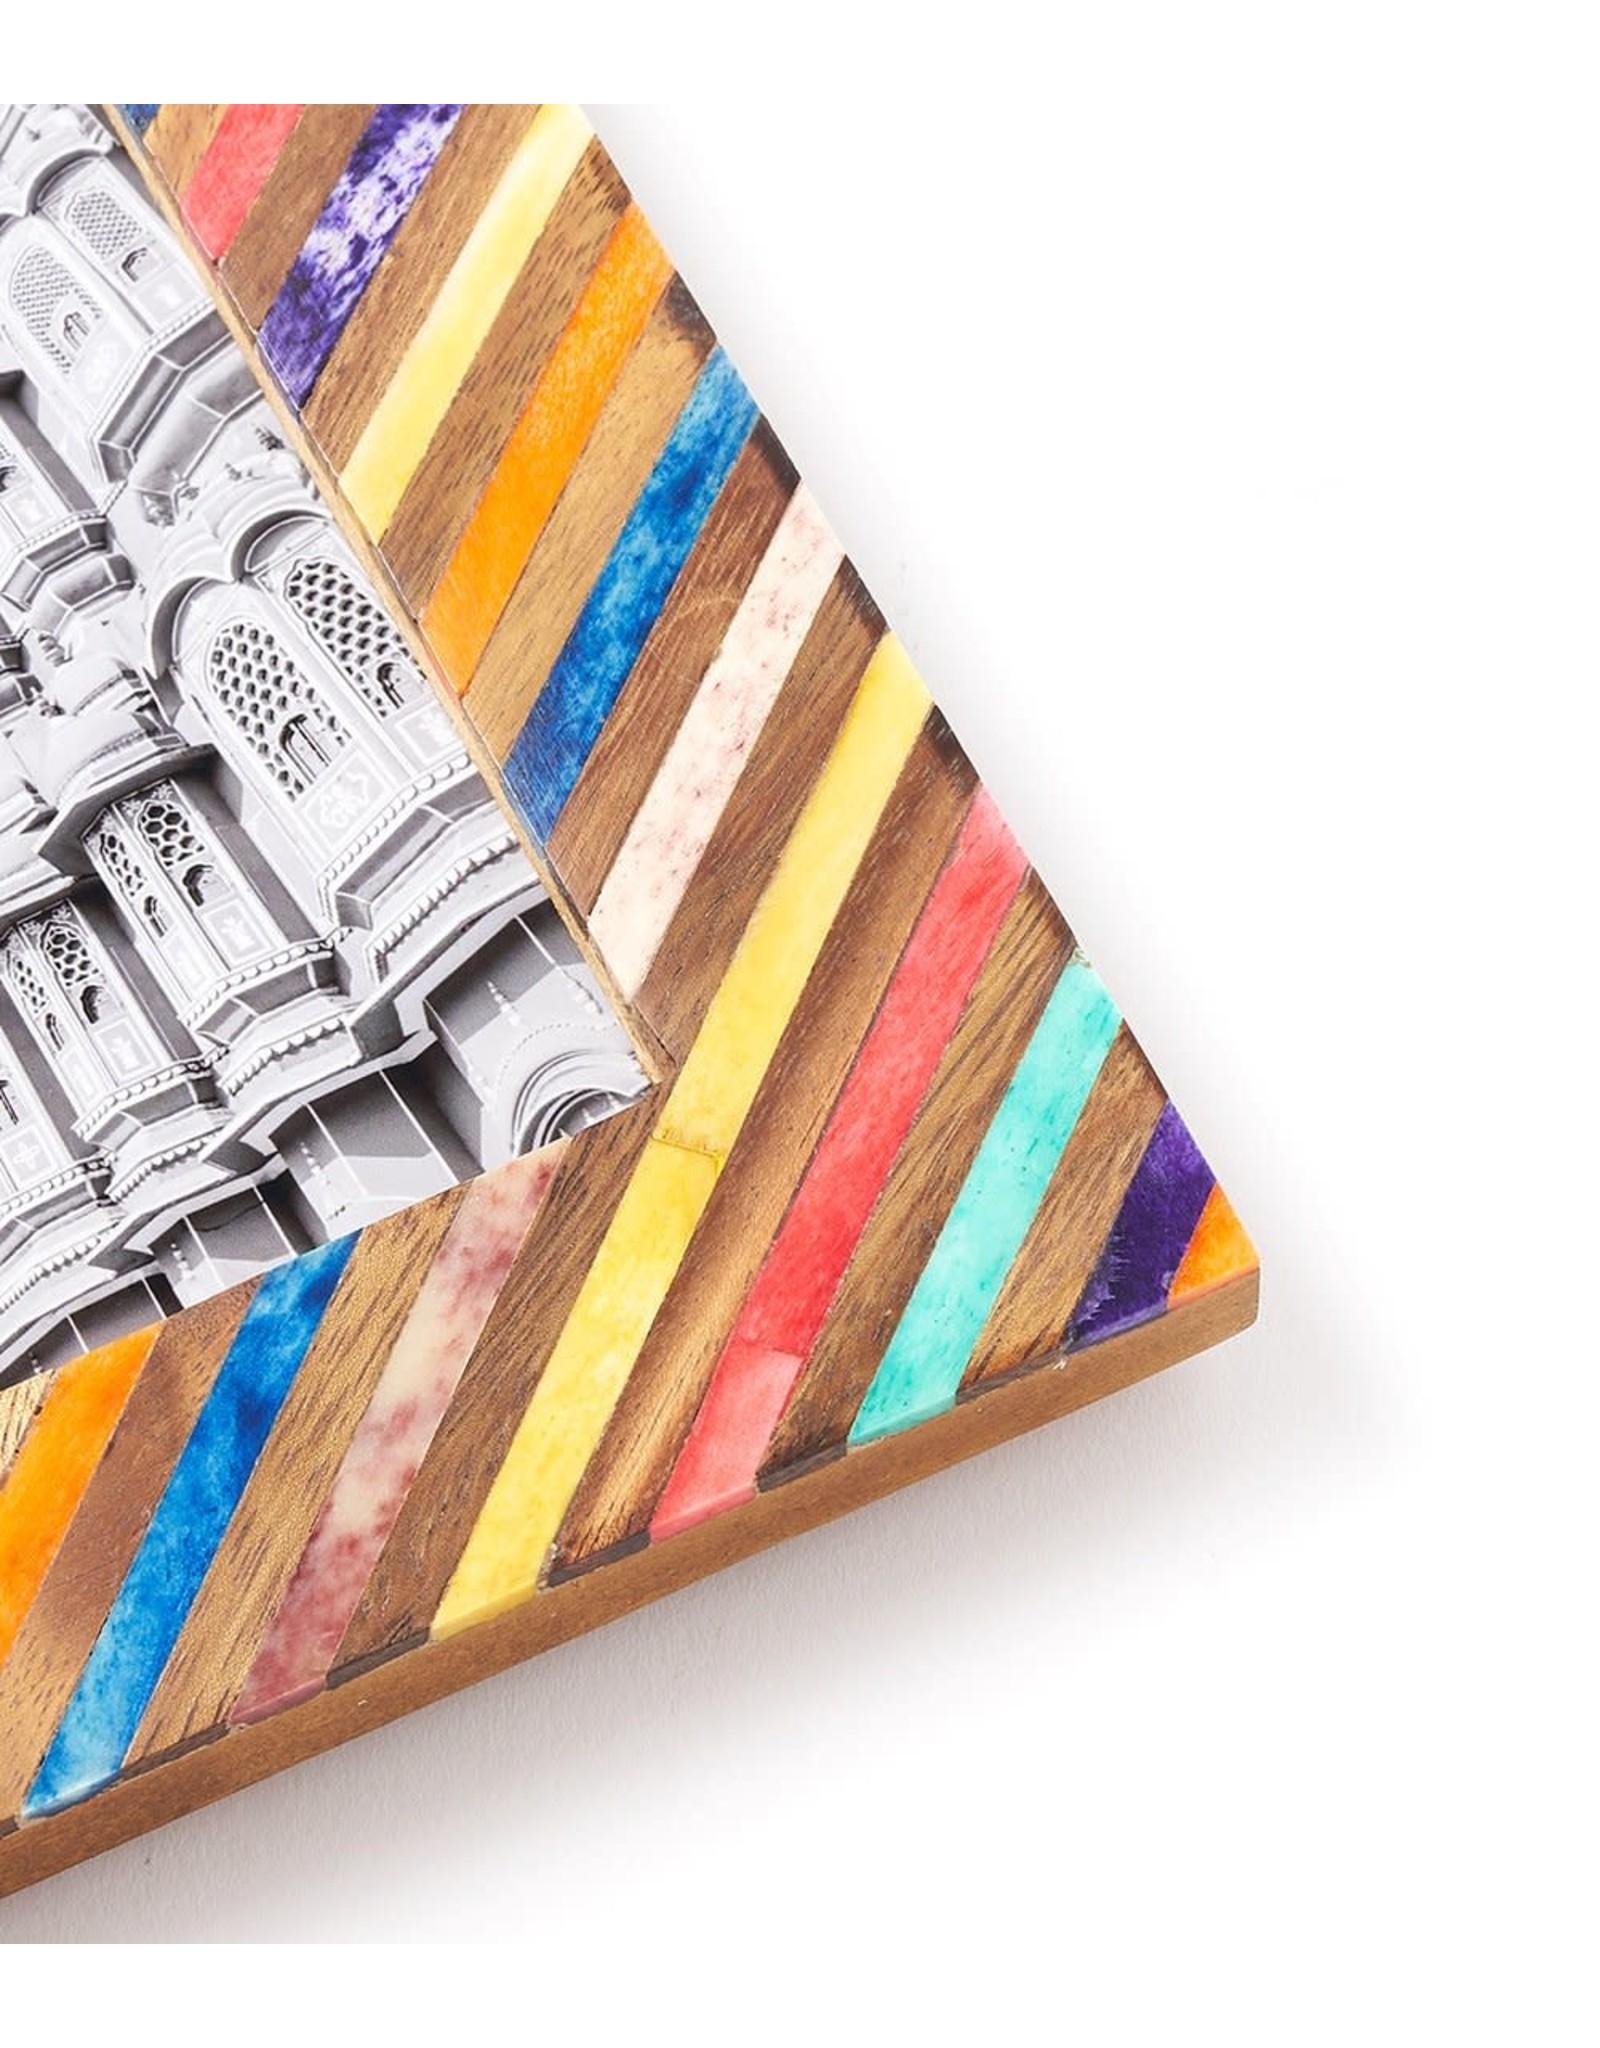 Banka Mundi Frame, 5 x 7, Multicolor, India